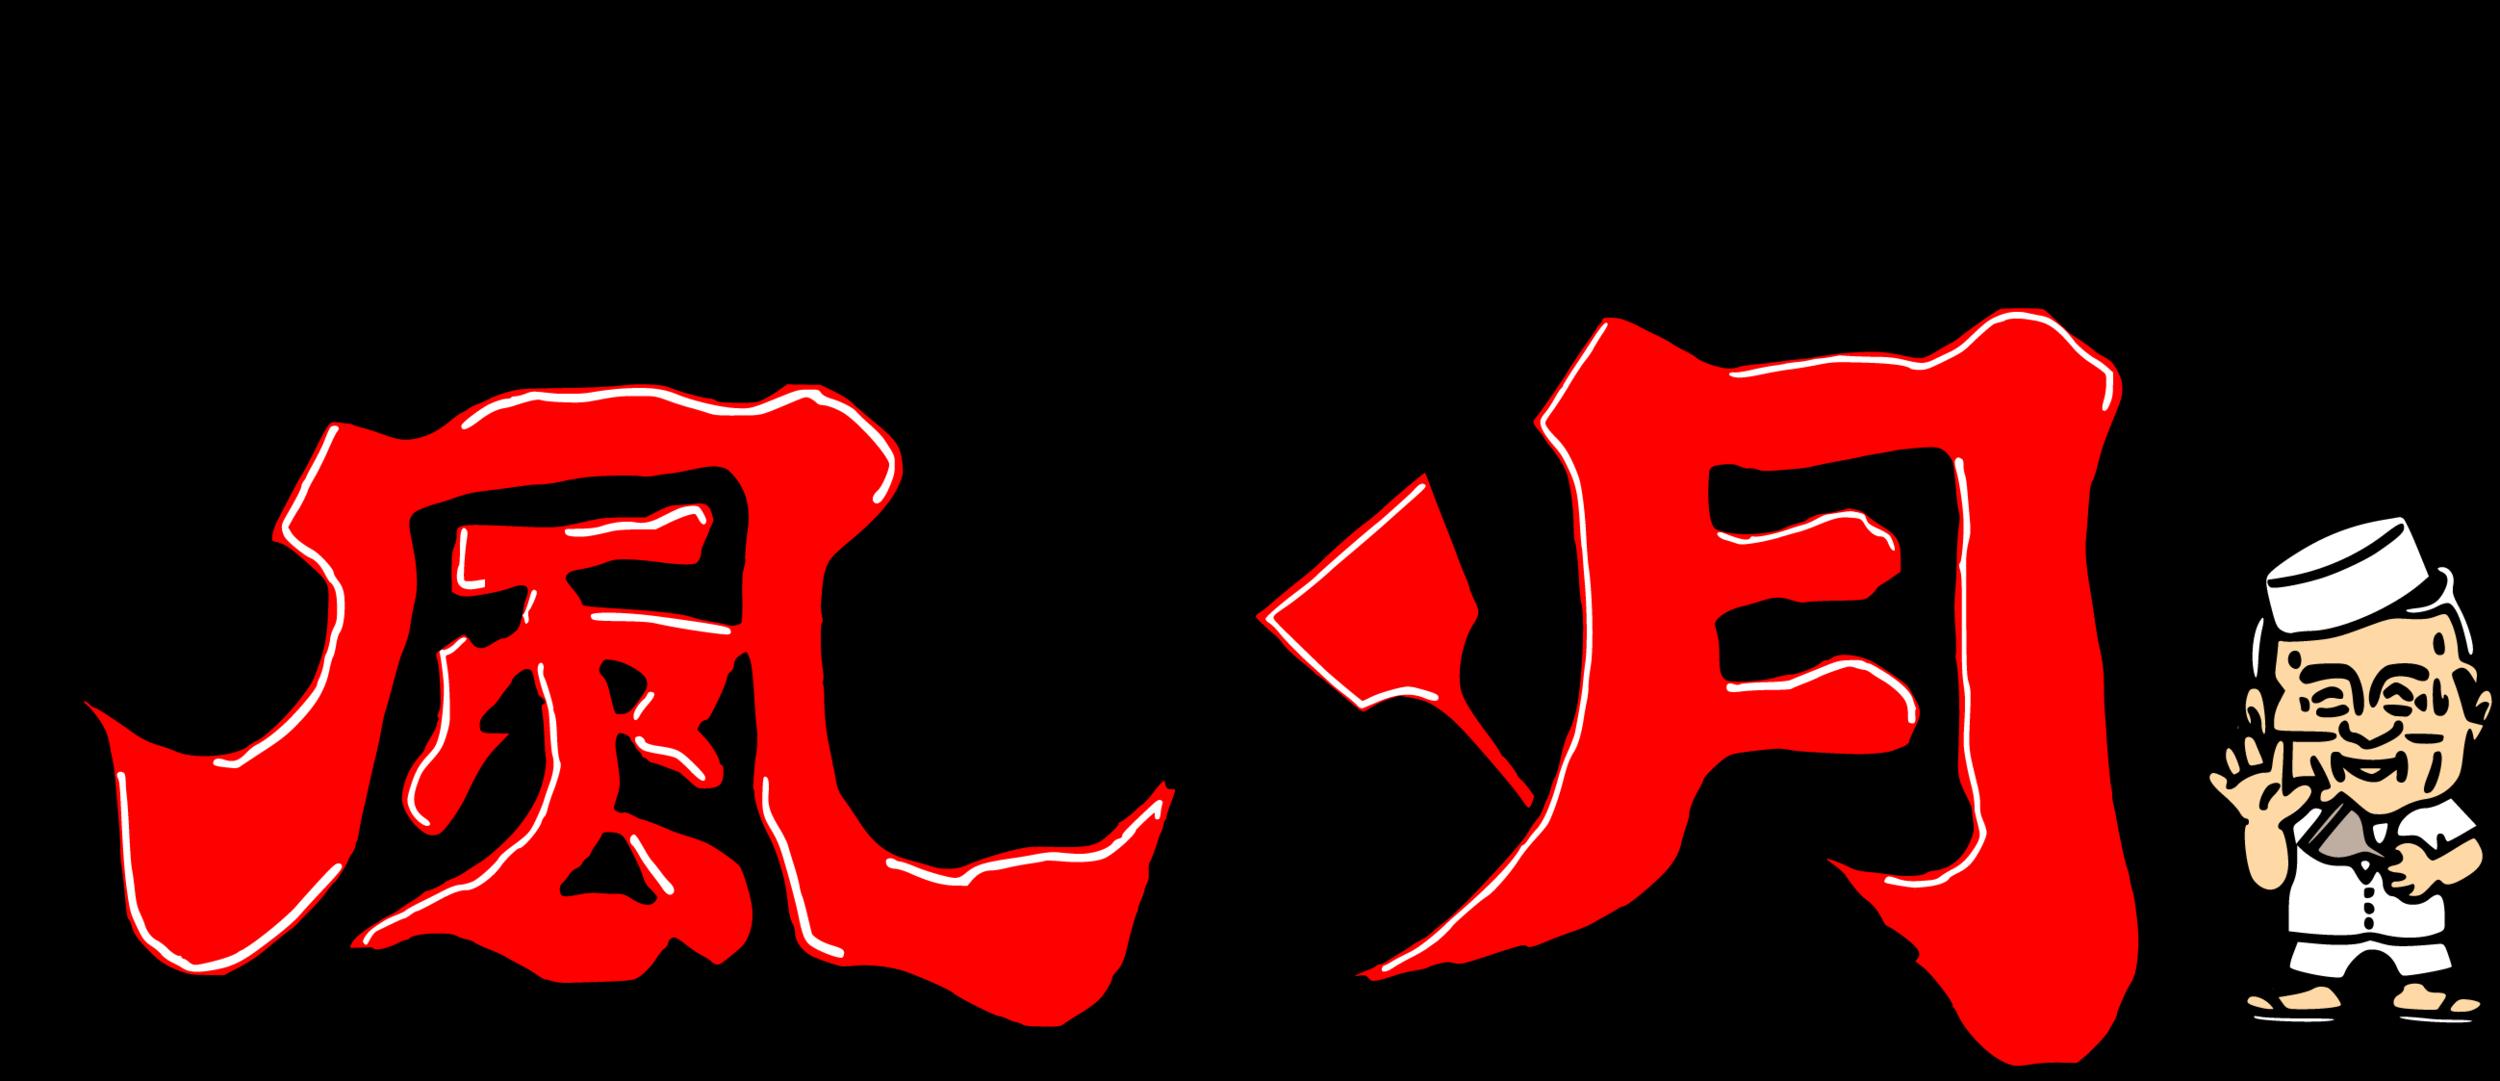 赤文字ロゴ社長 - 二神知亜紀.png